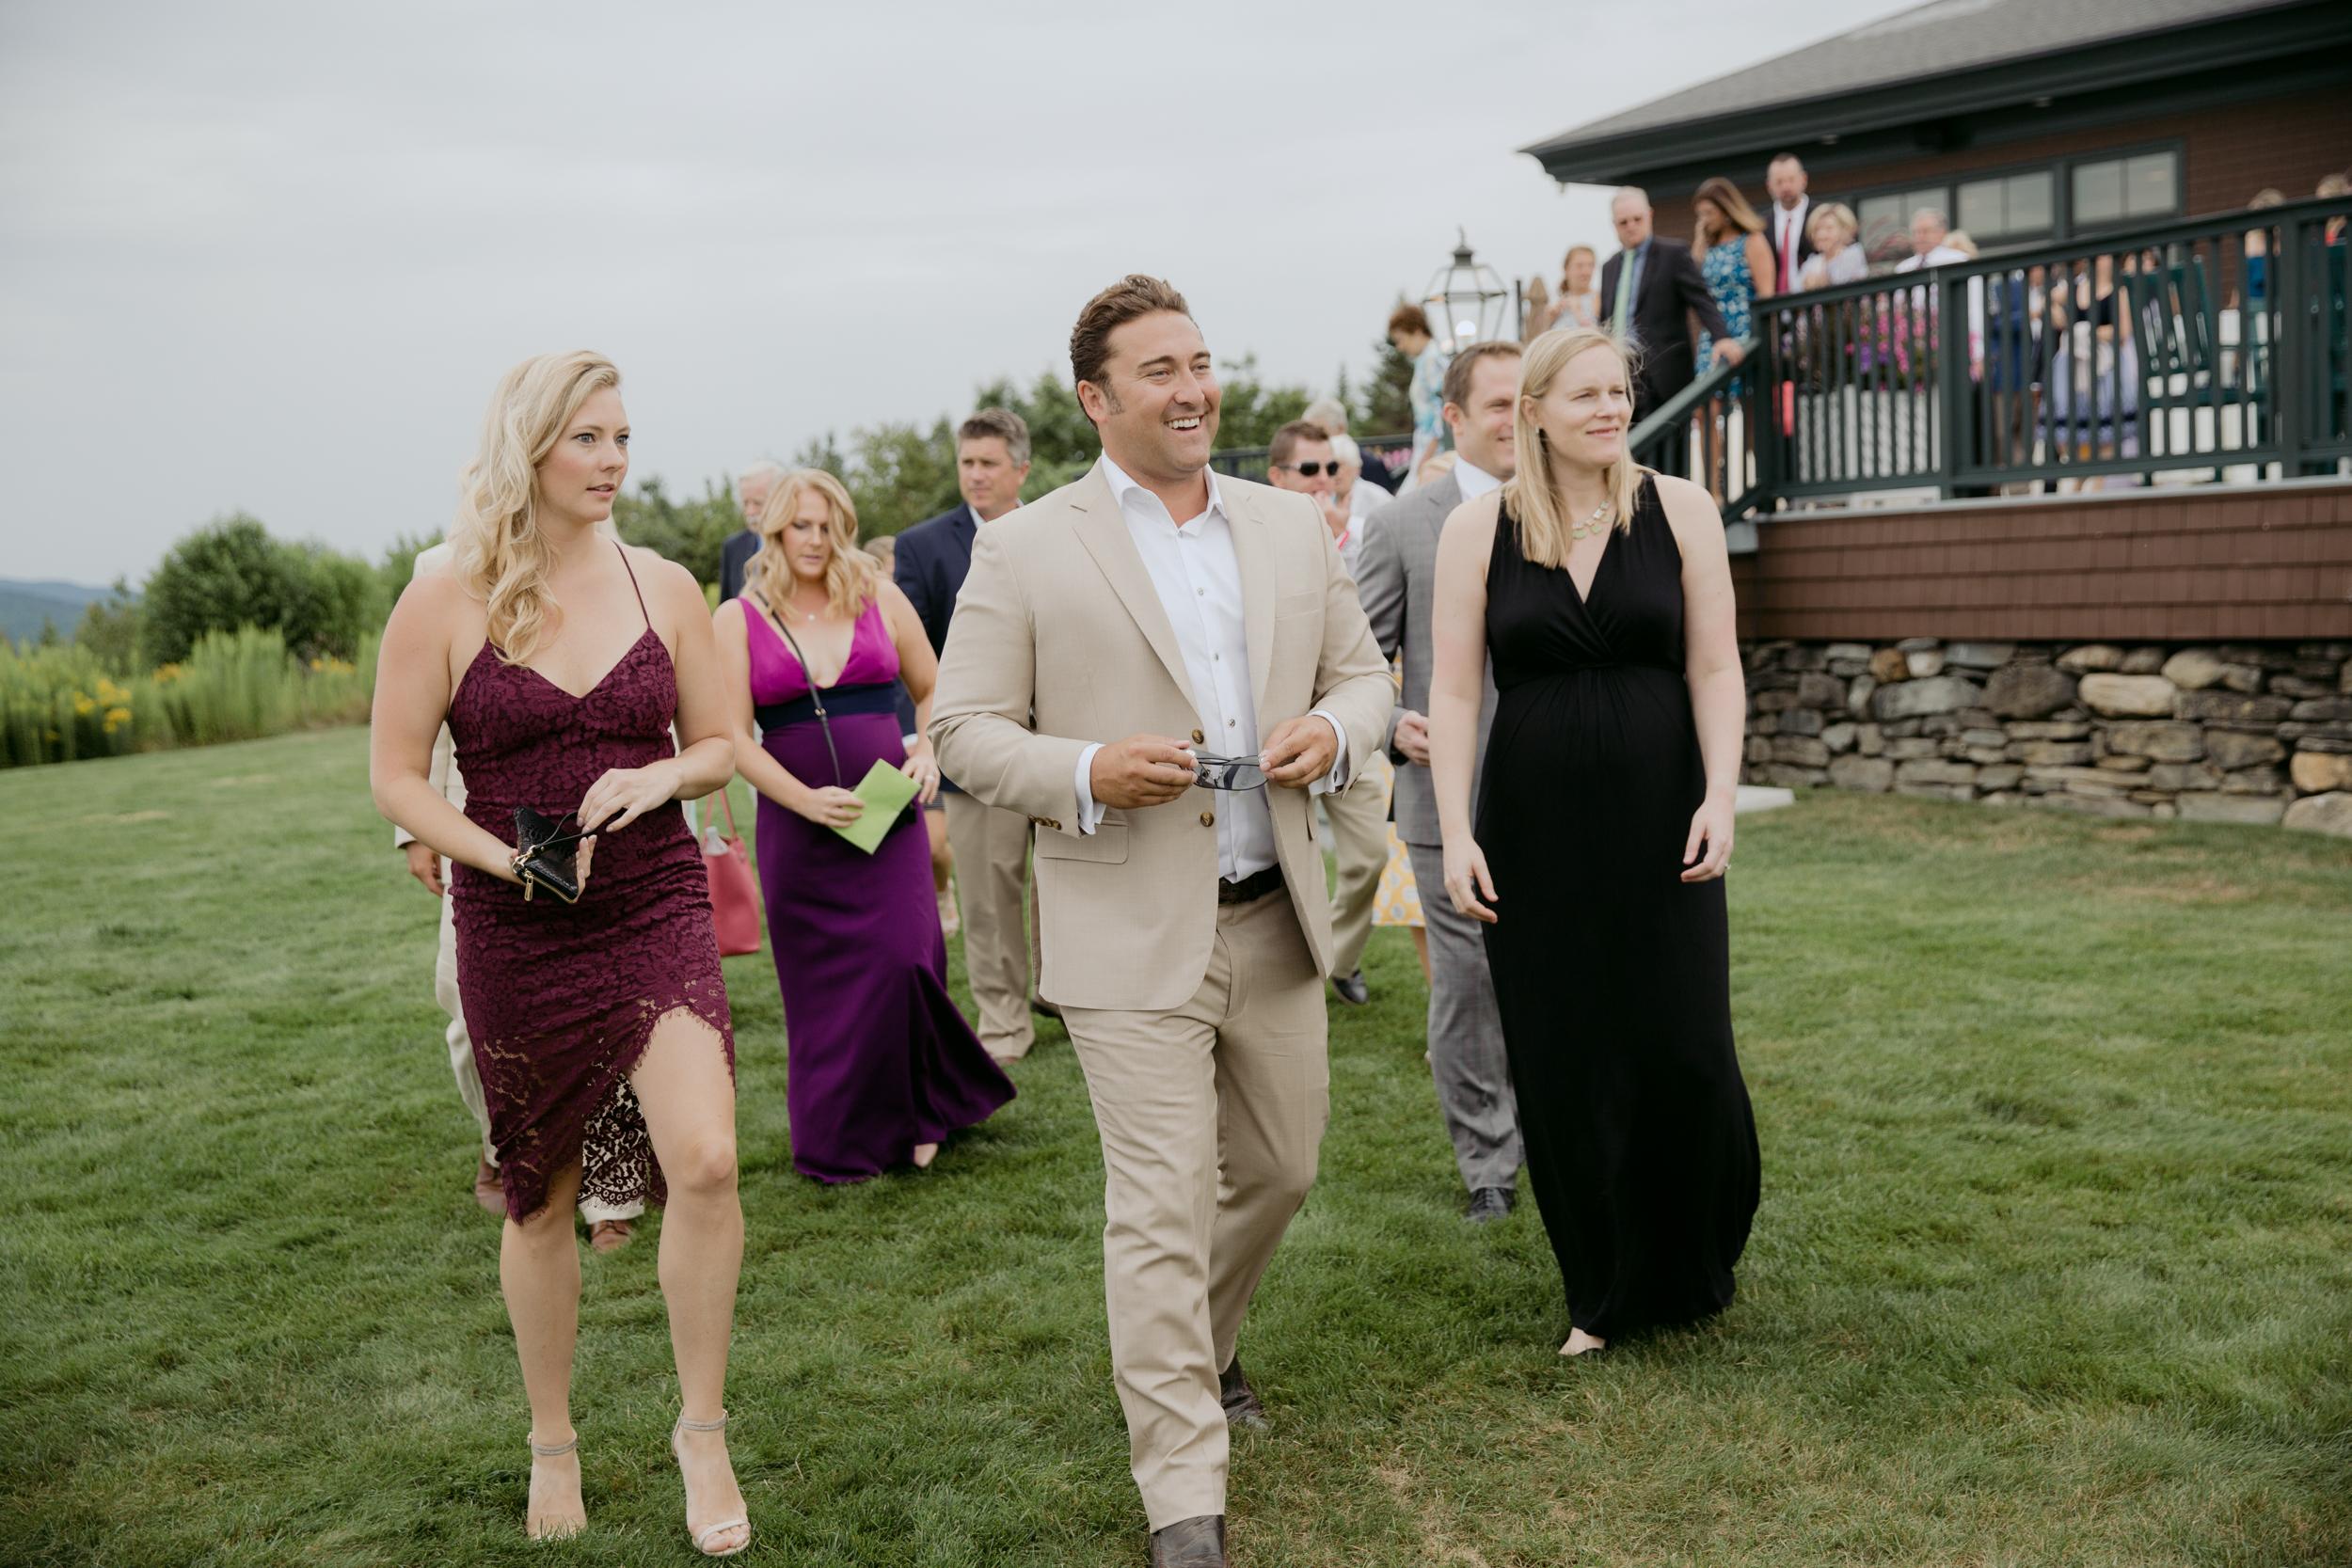 point_lookout_northport_Maine_Midcoast_wedding_leslie_justin-11.jpg